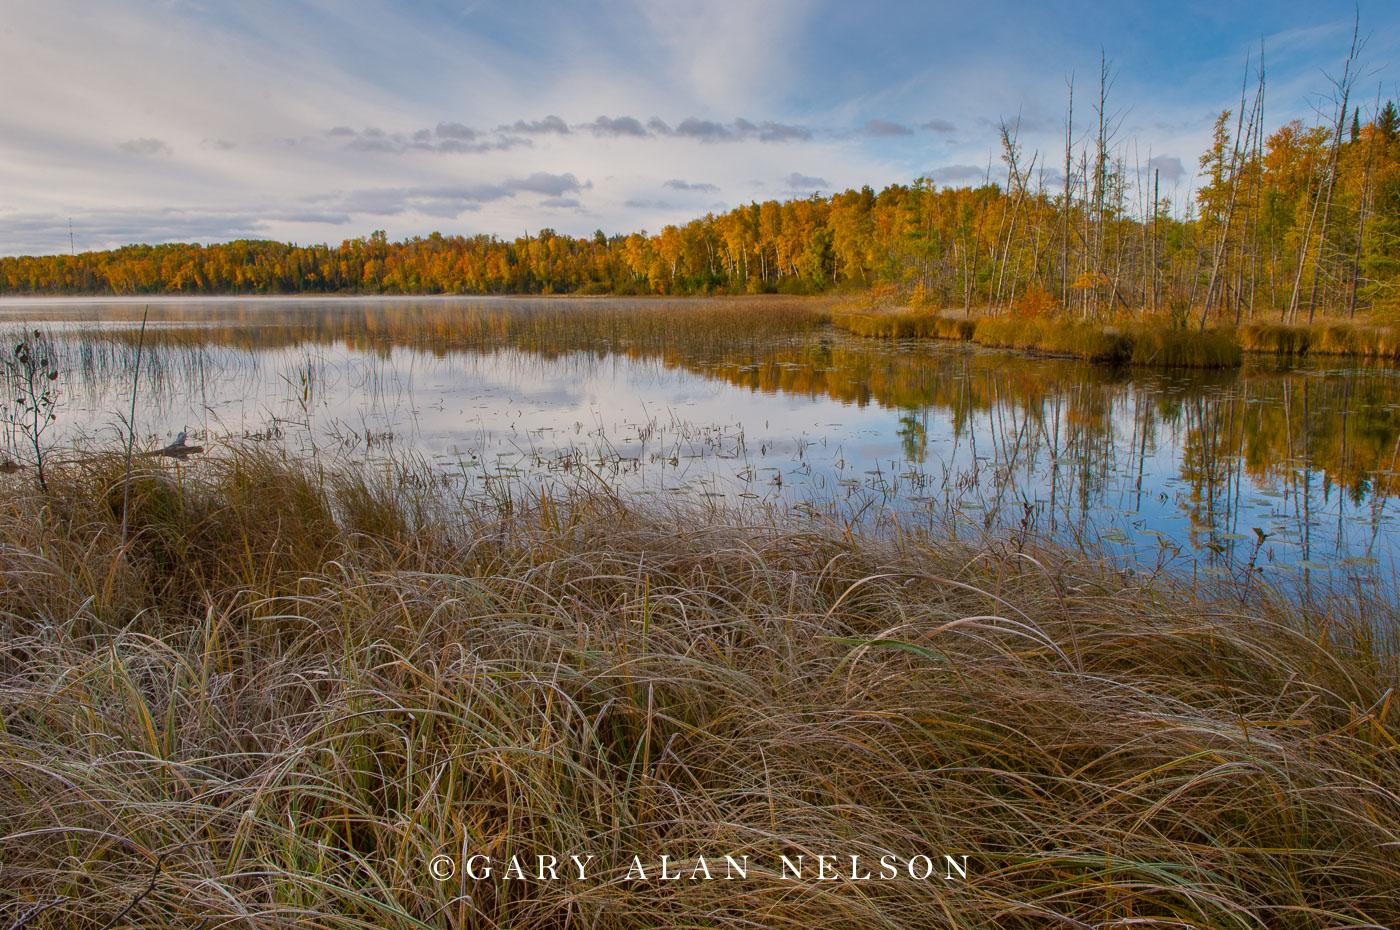 minnesota, national forest, chippewa national forest, lake grasses, sedges, lakeshore, autumn, fall, reflections, photo